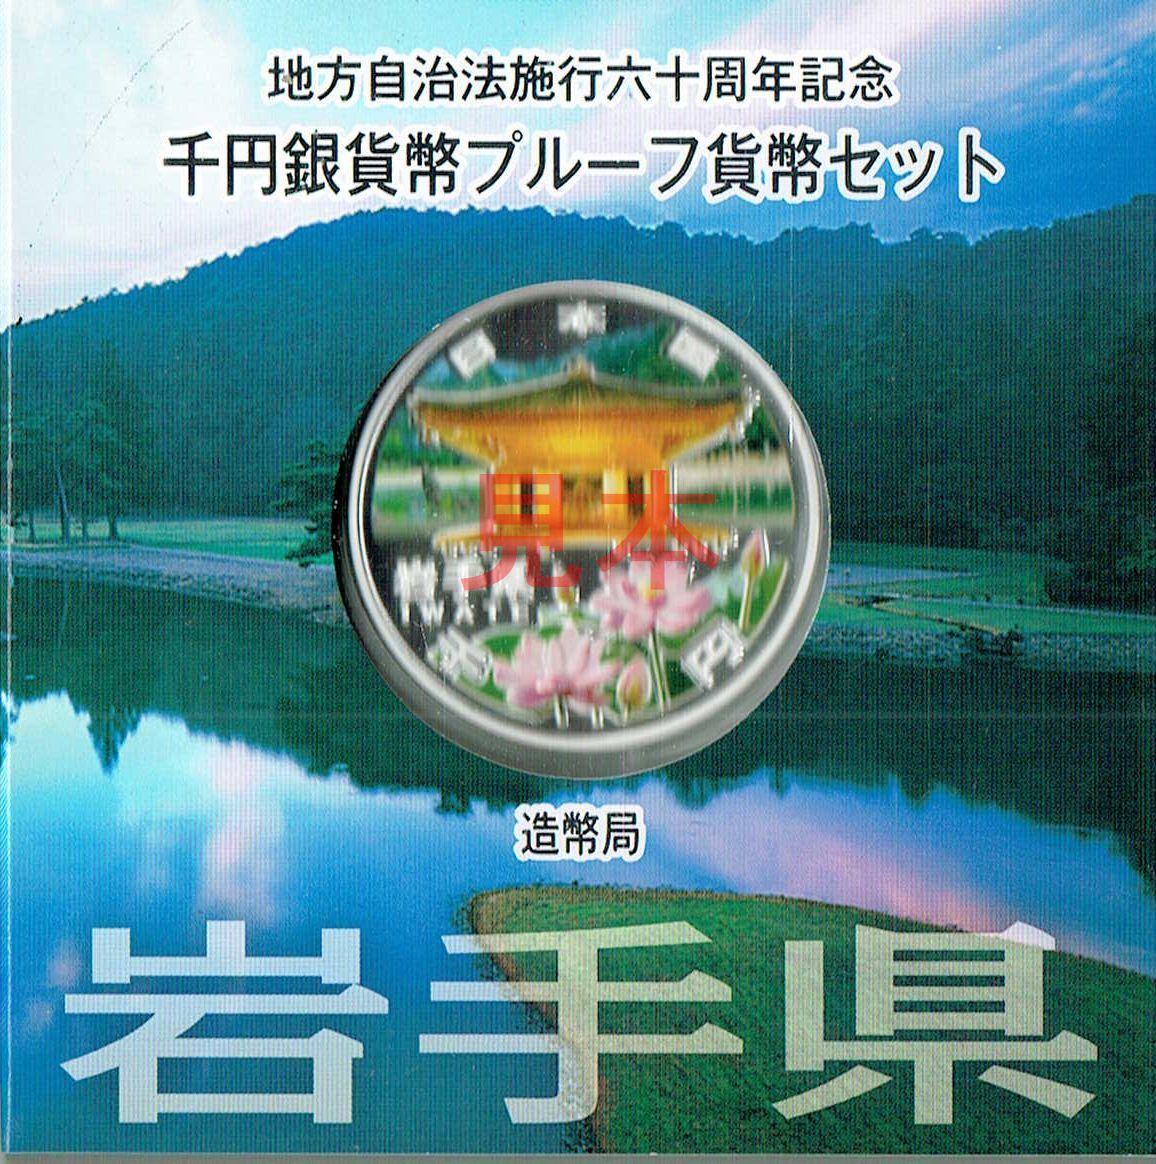 商品名「地方自治法施行60周年記念千円銀貨幣プルーフ Aセット 岩手県」